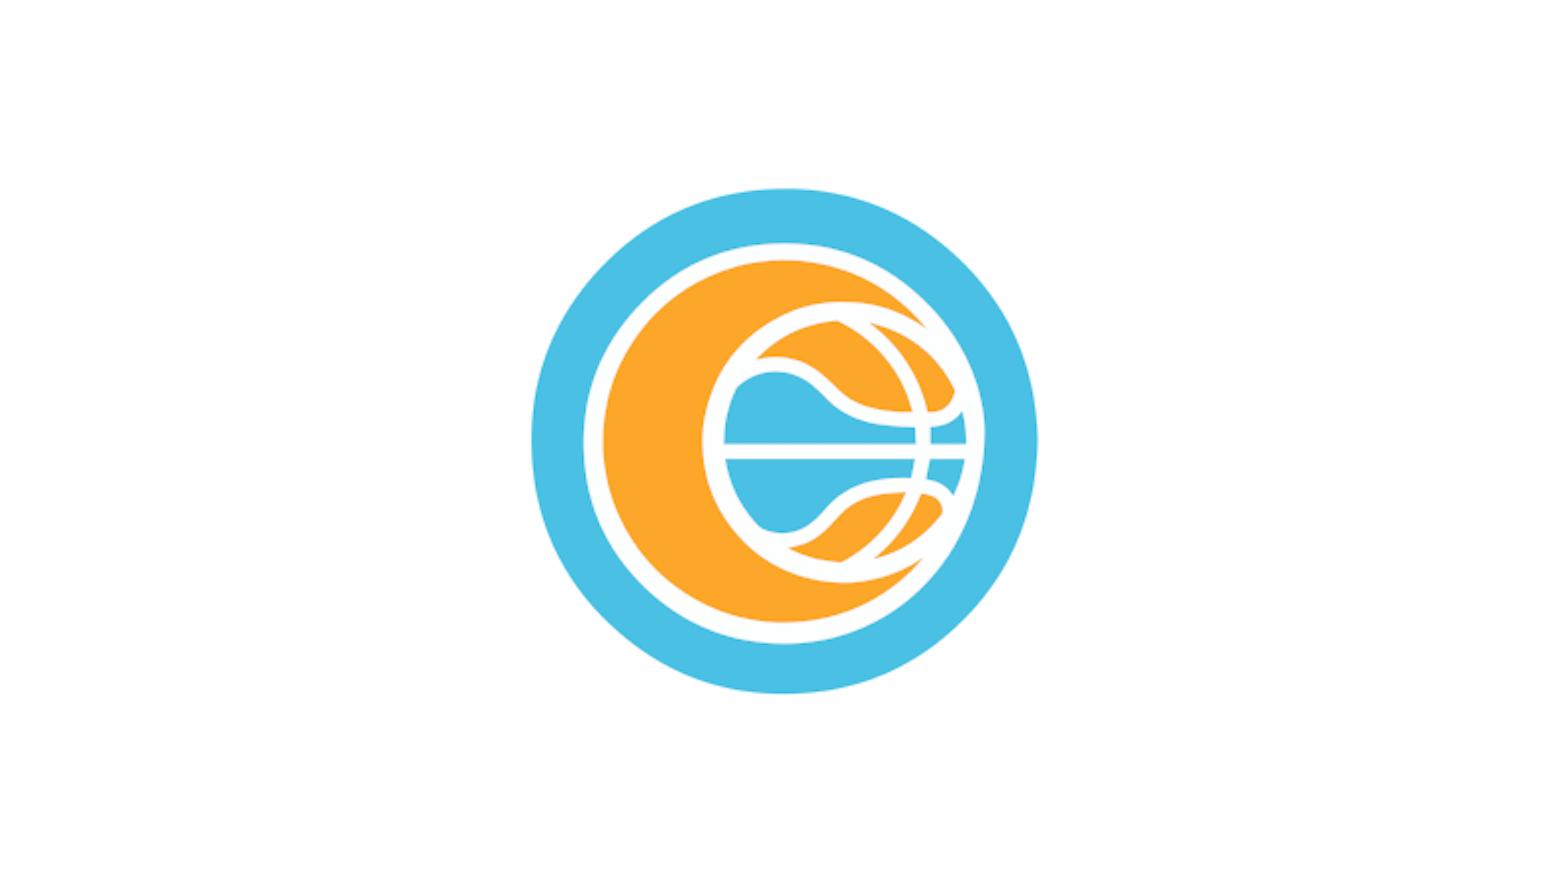 The Clutch logo